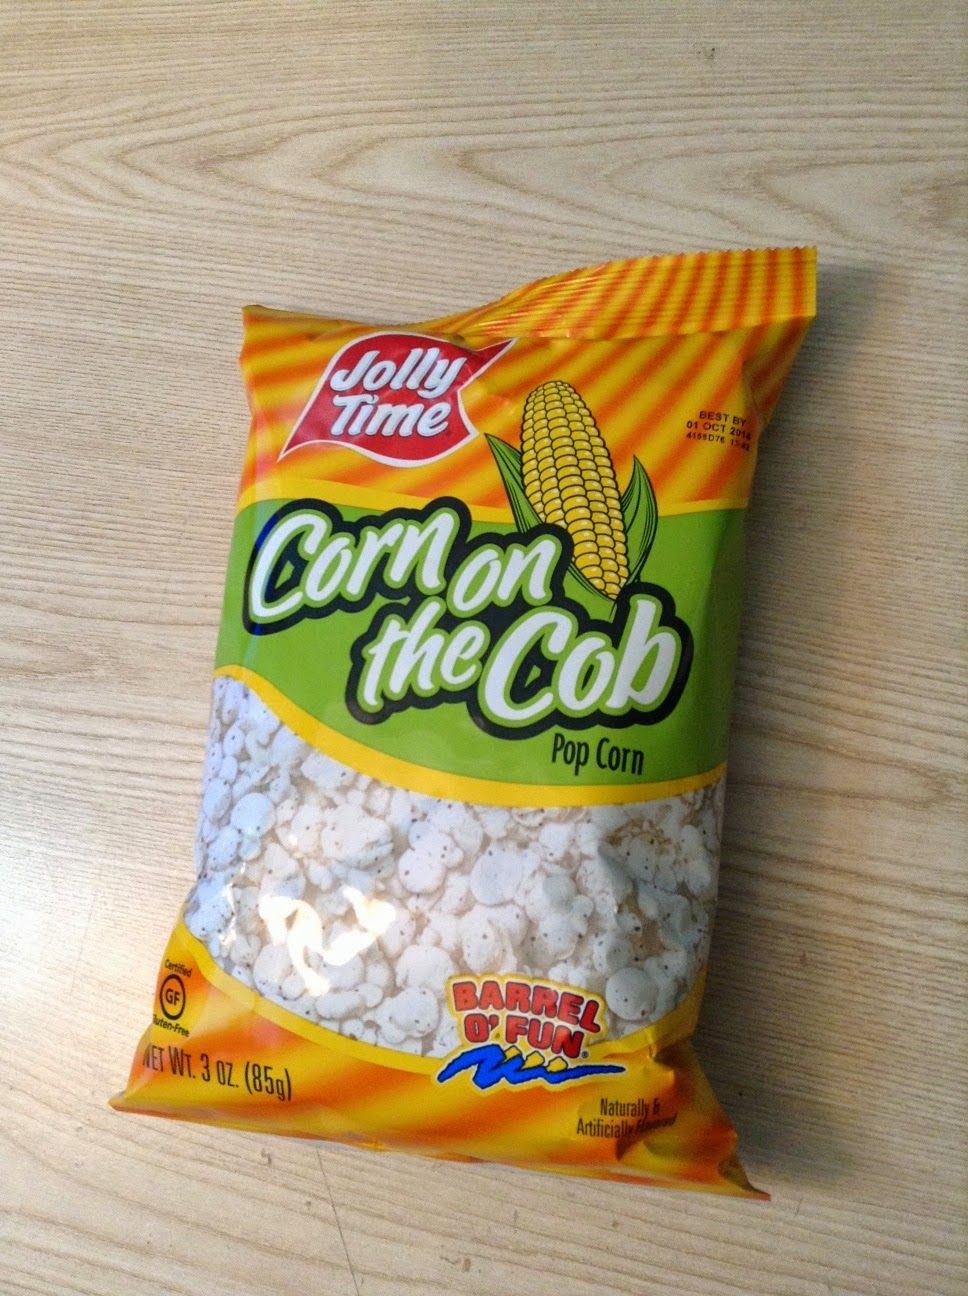 Jolly Time Corn On The Cob Popcorn